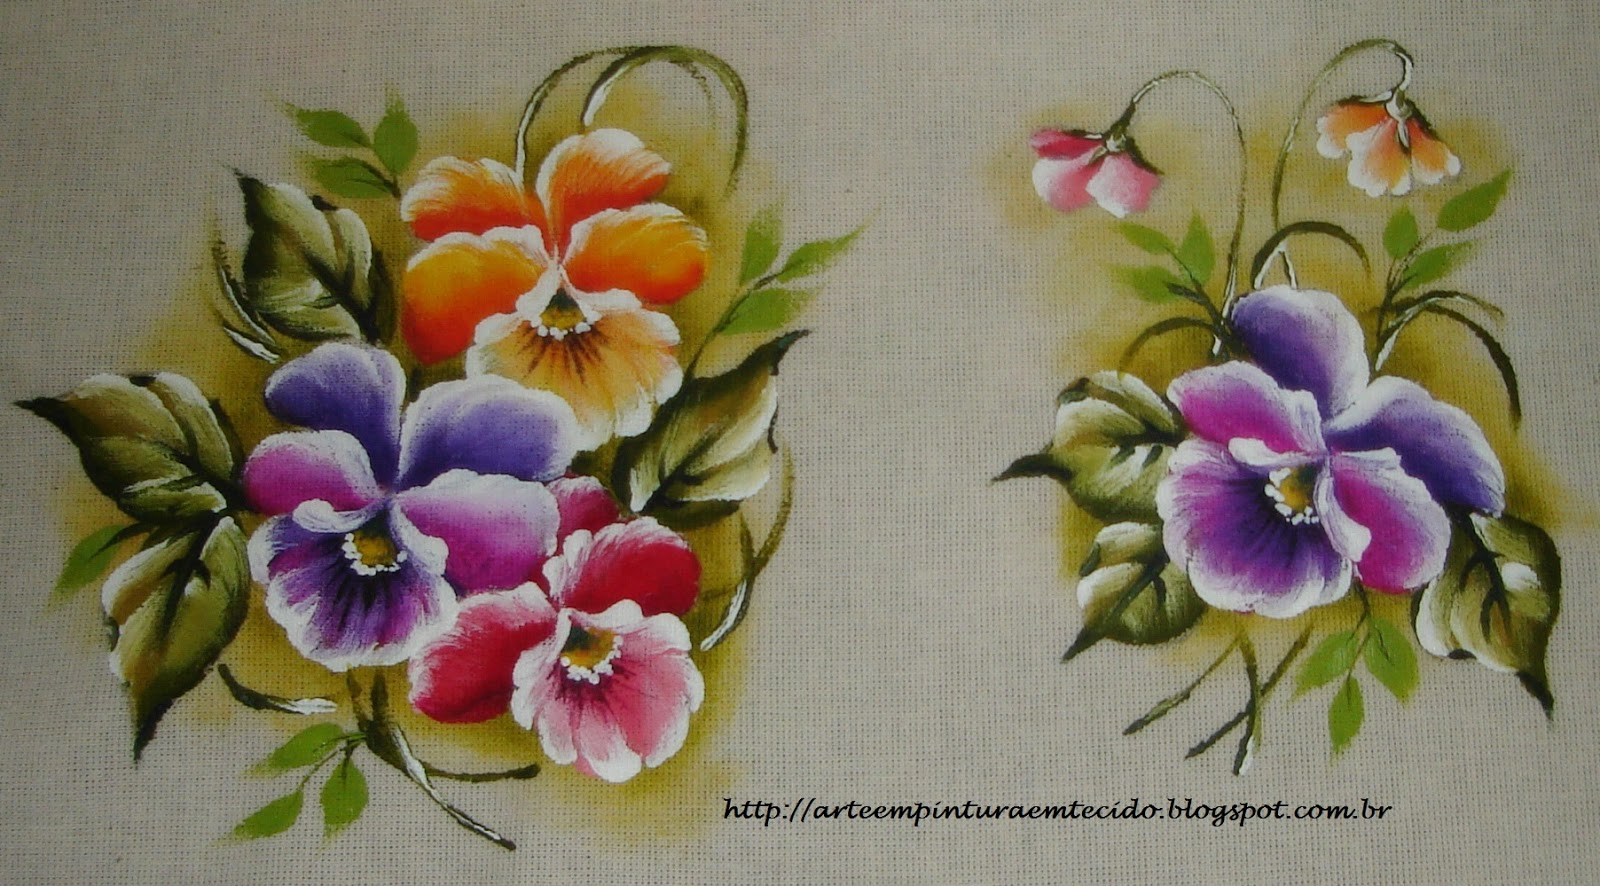 http://4.bp.blogspot.com/-sGc5GM0HSr0/UzH8yecVpgI/AAAAAAAAPMg/H6FASBvtIAQ/s1600/pintura+em+tecido+amor+perfeito.JPG